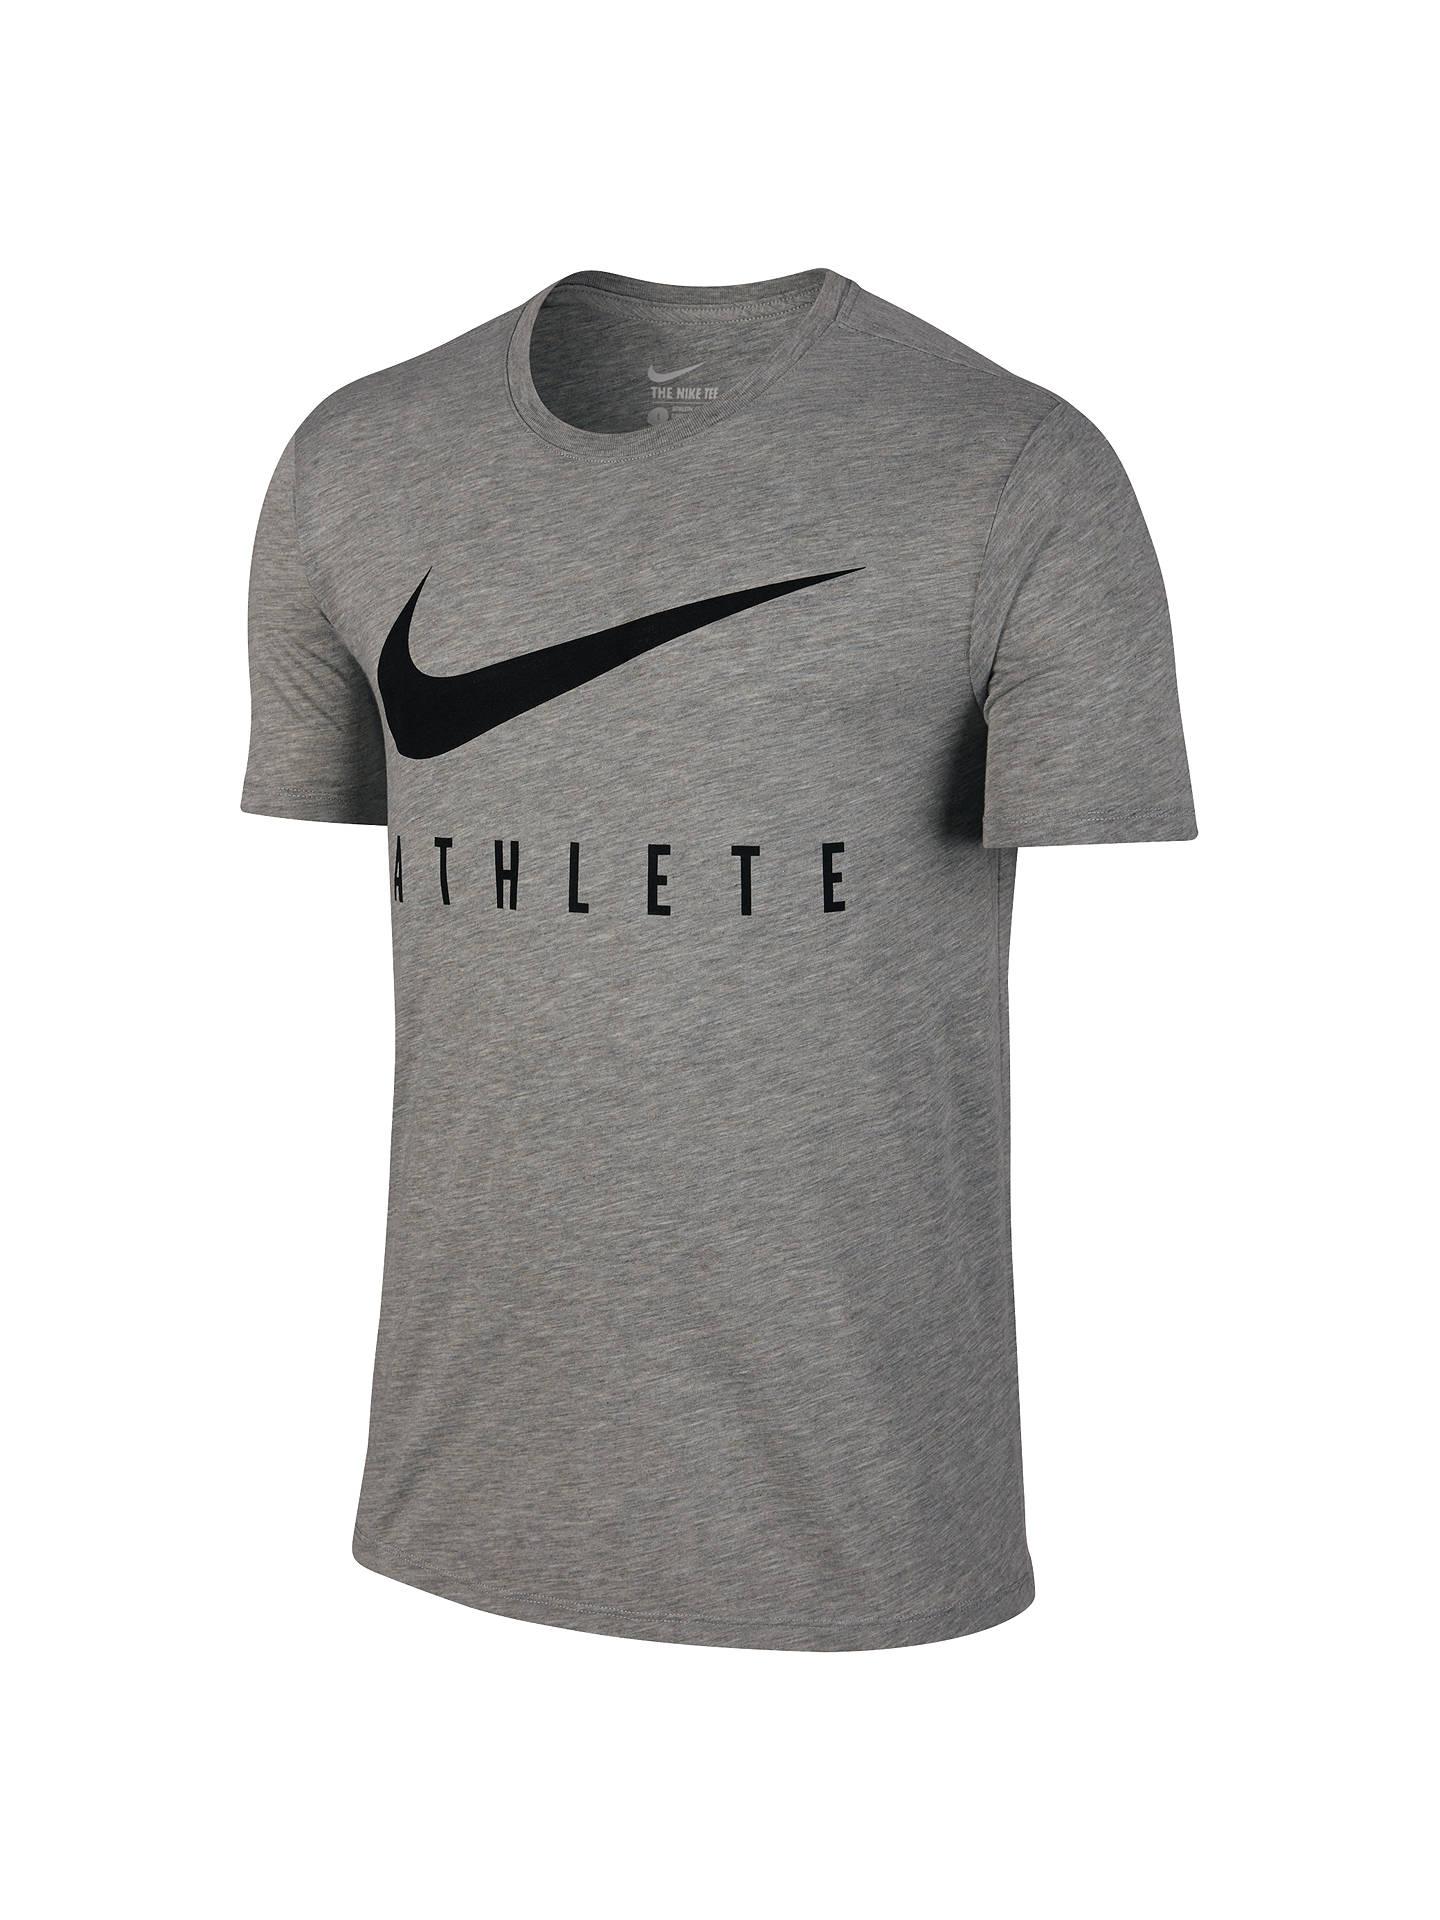 2bec1fdce9526 Nike Dri-FIT Swoosh Athlete Training T-Shirt, Grey Heather at John ...